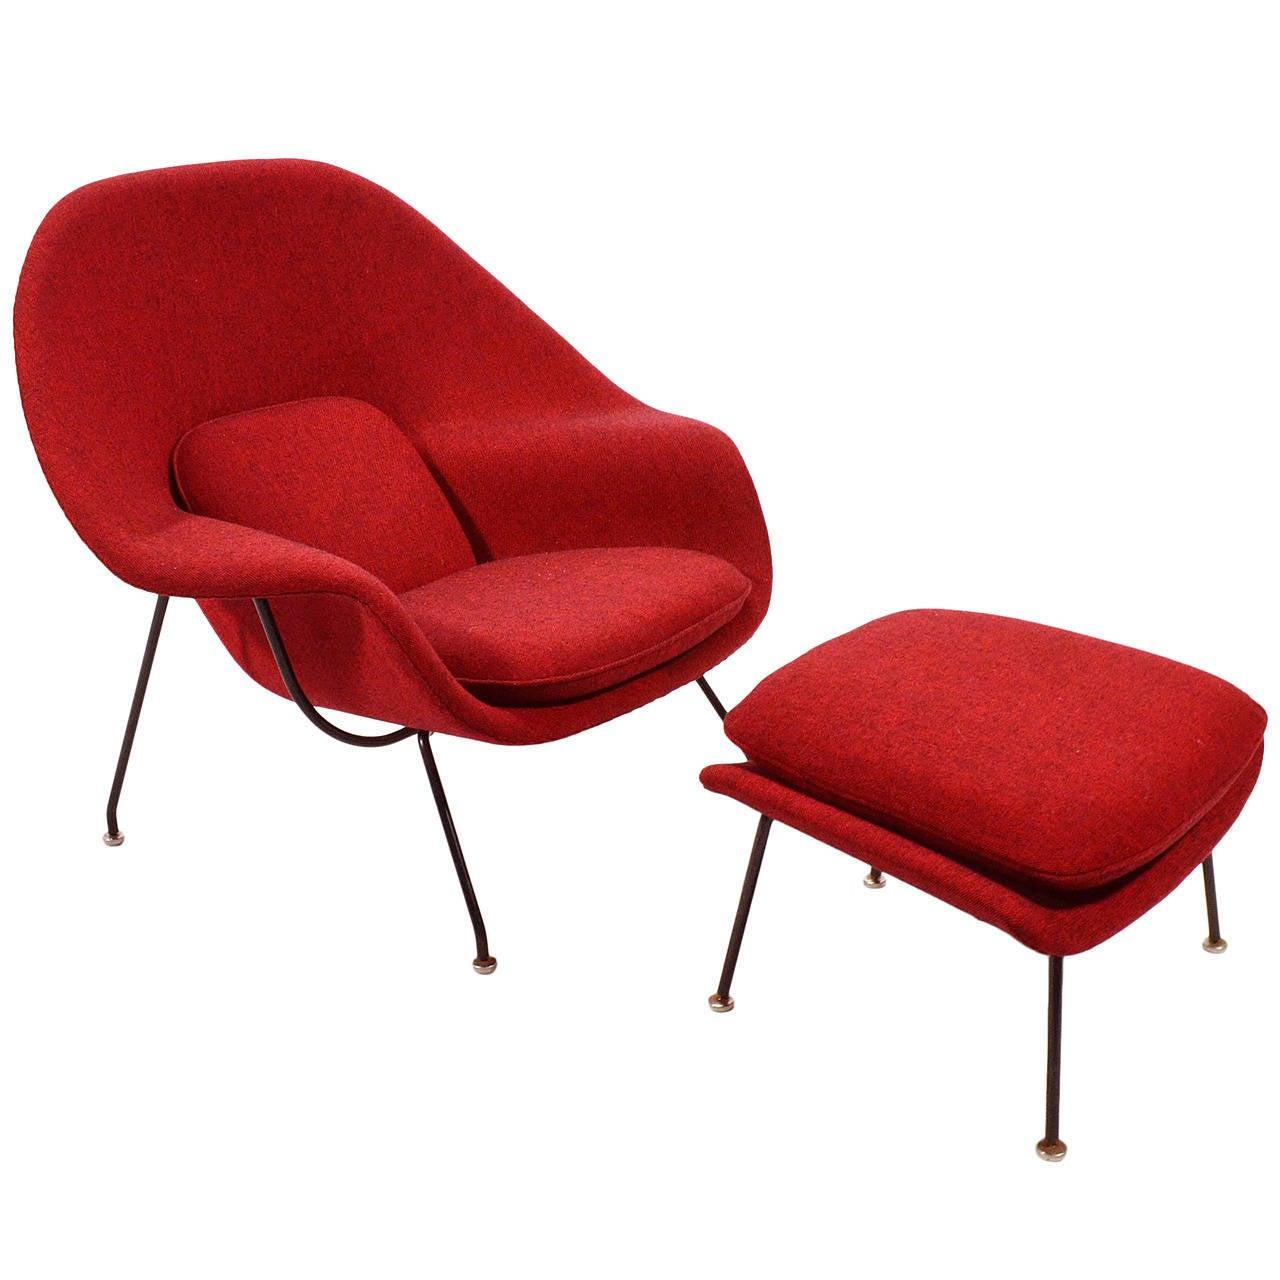 Saarinen womb chair - Eero Saarinen Womb Chair And Ottoman Upholstered In Alexander Girard Fabric 1